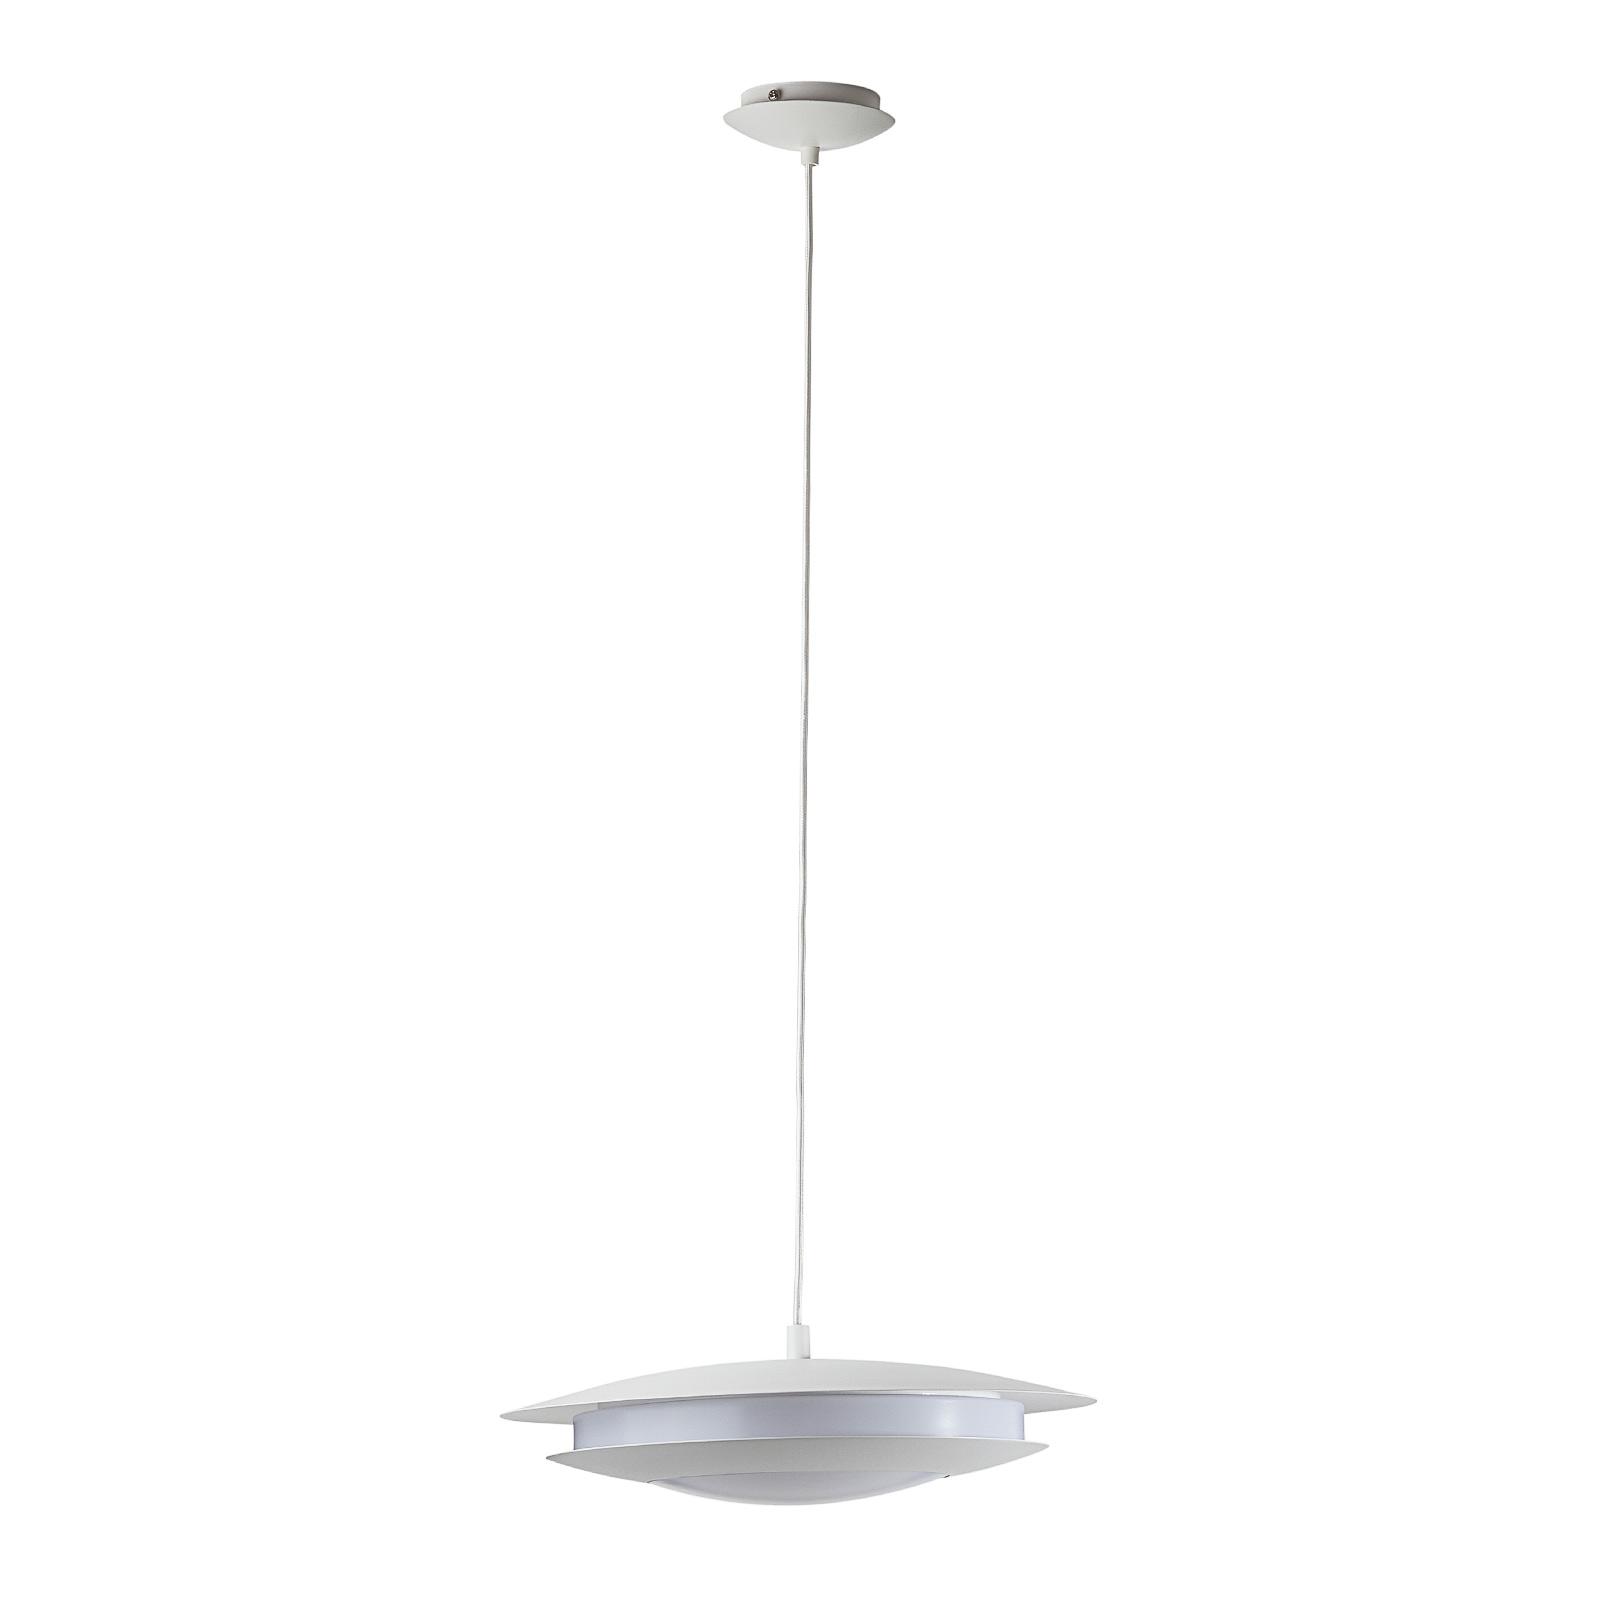 EGLO connect Moneva-C LED-hengelampe hvit Ø 40,5